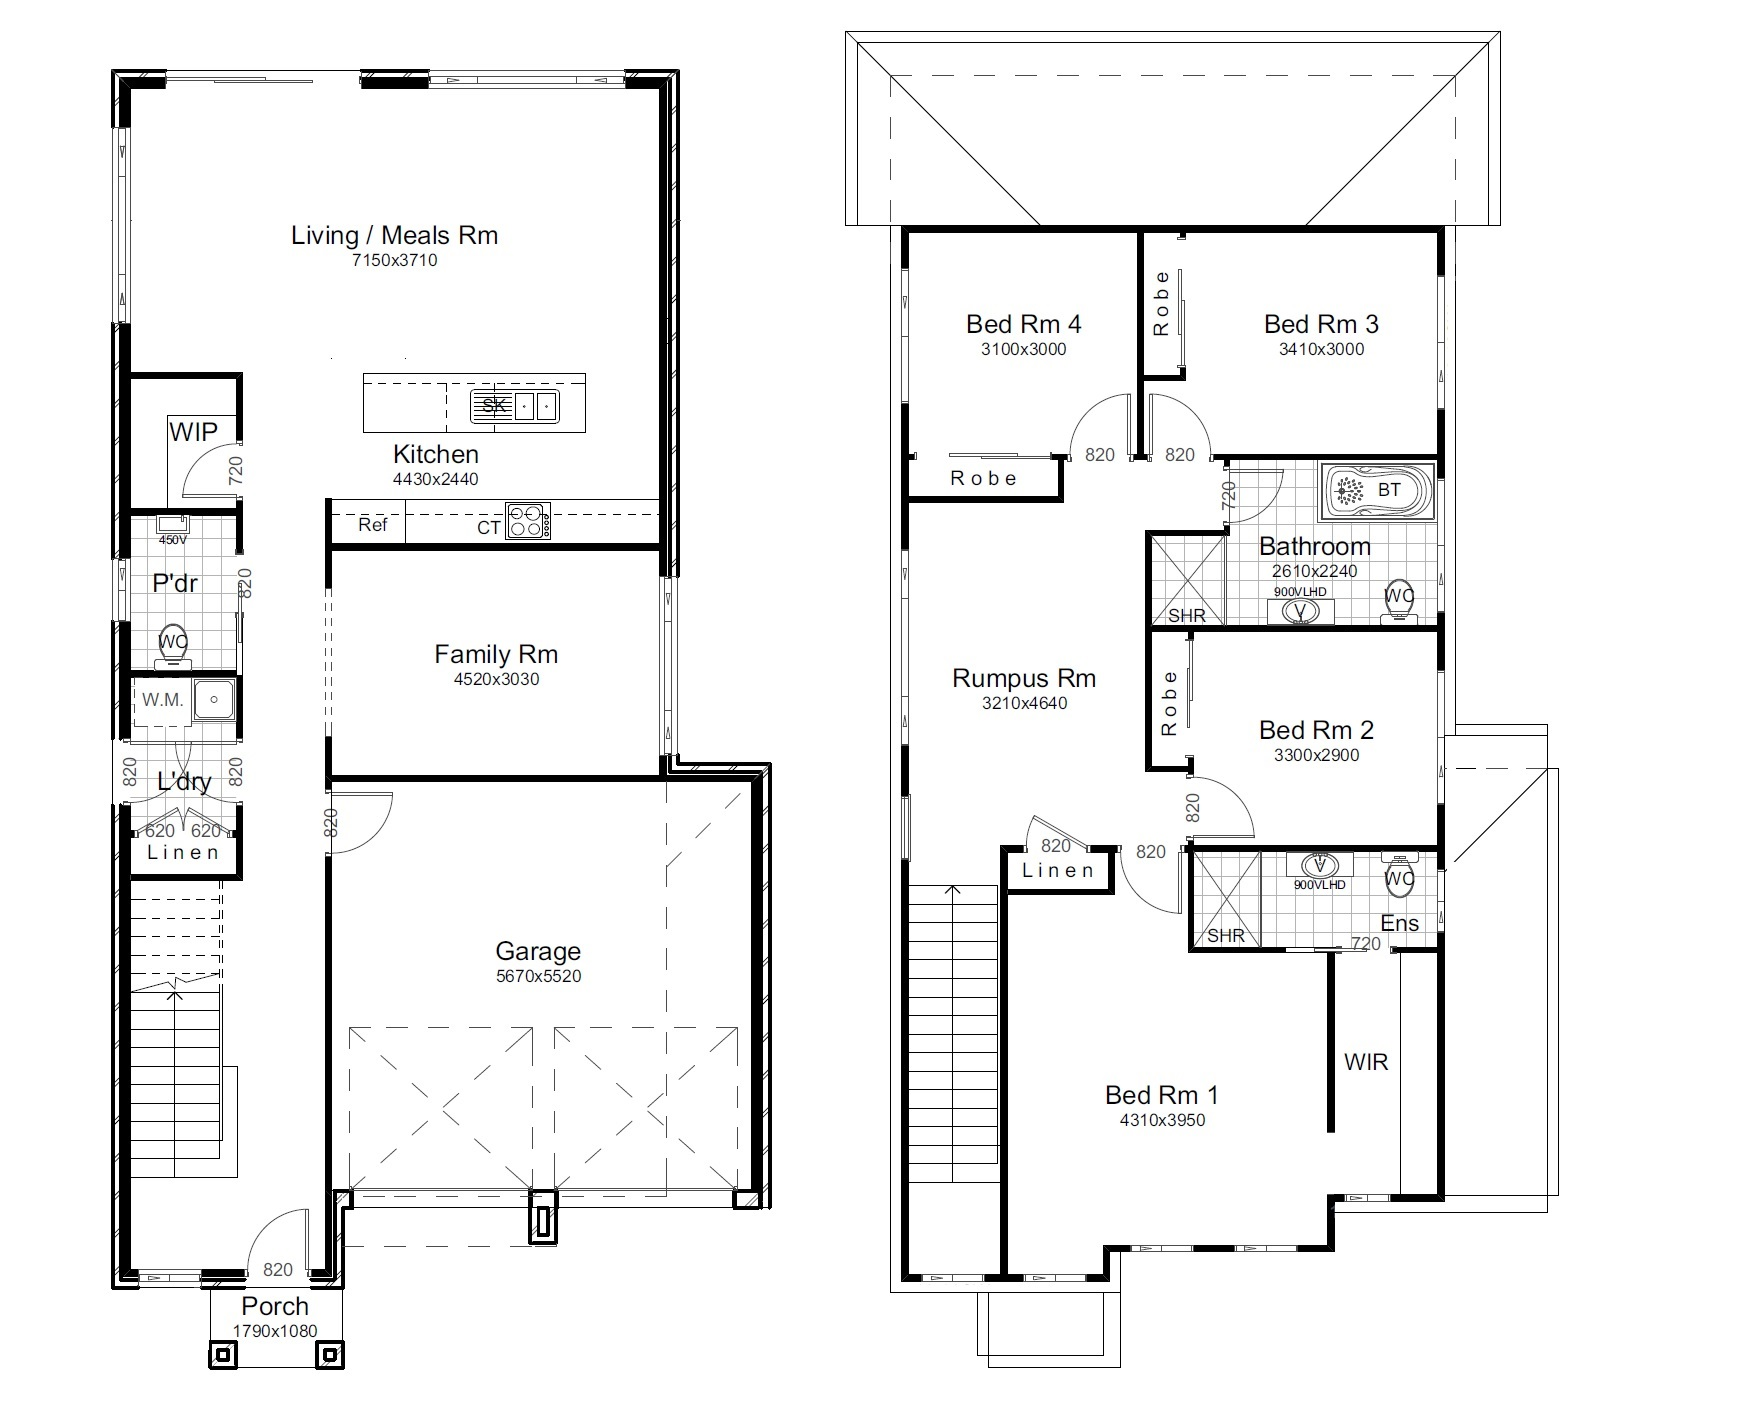 L11390584 AUSTRAL NSW 2179 - Floor plan